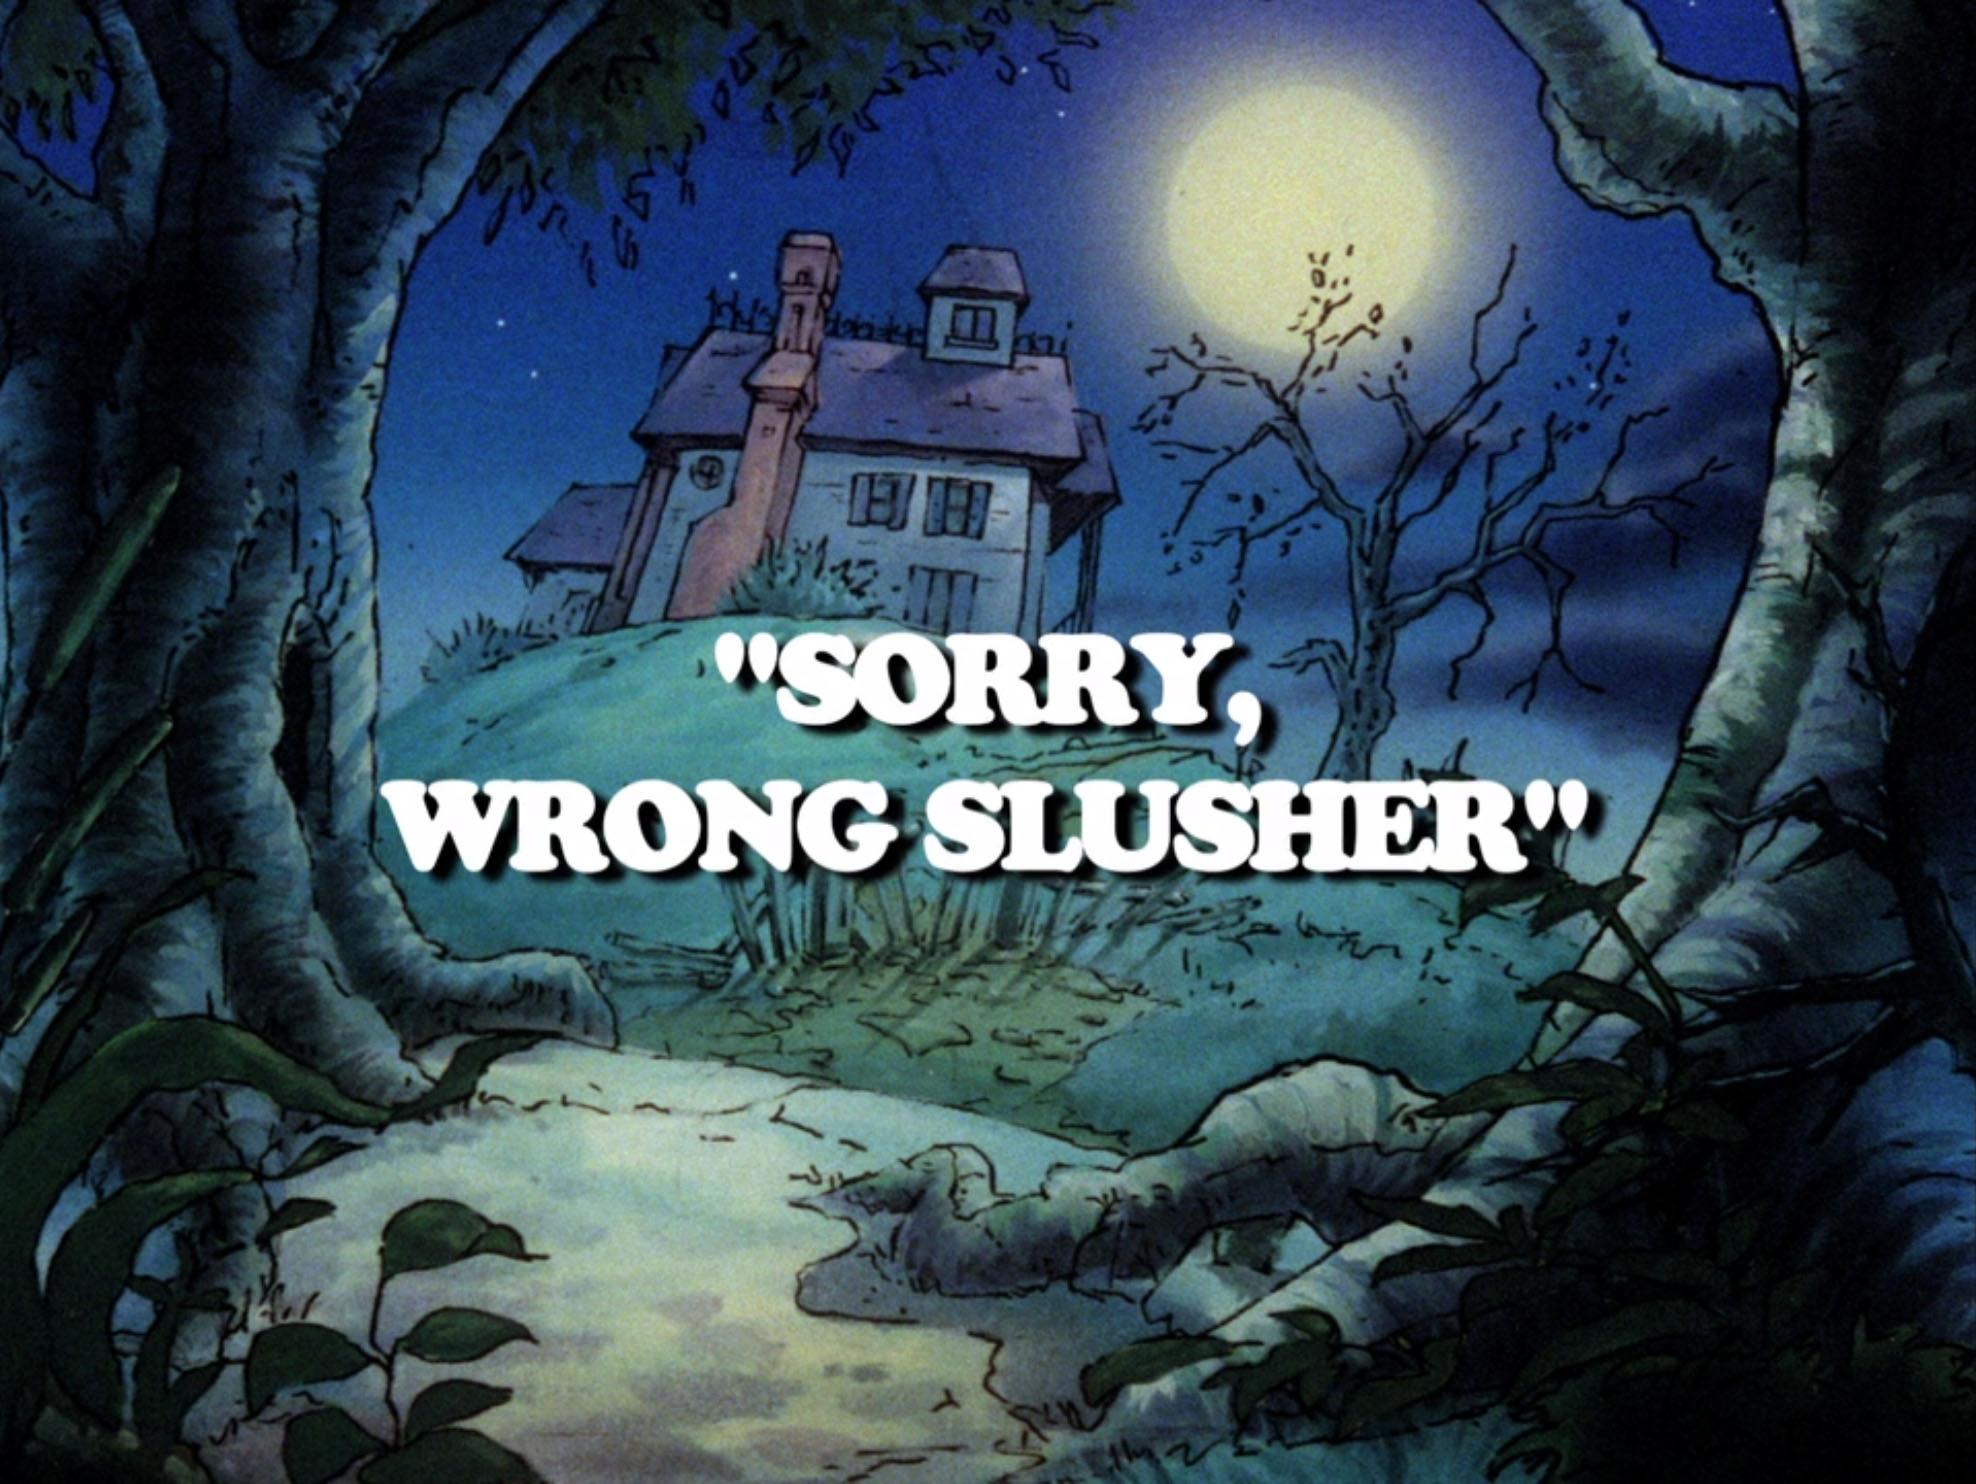 File:Sorry wrong slusher.jpg